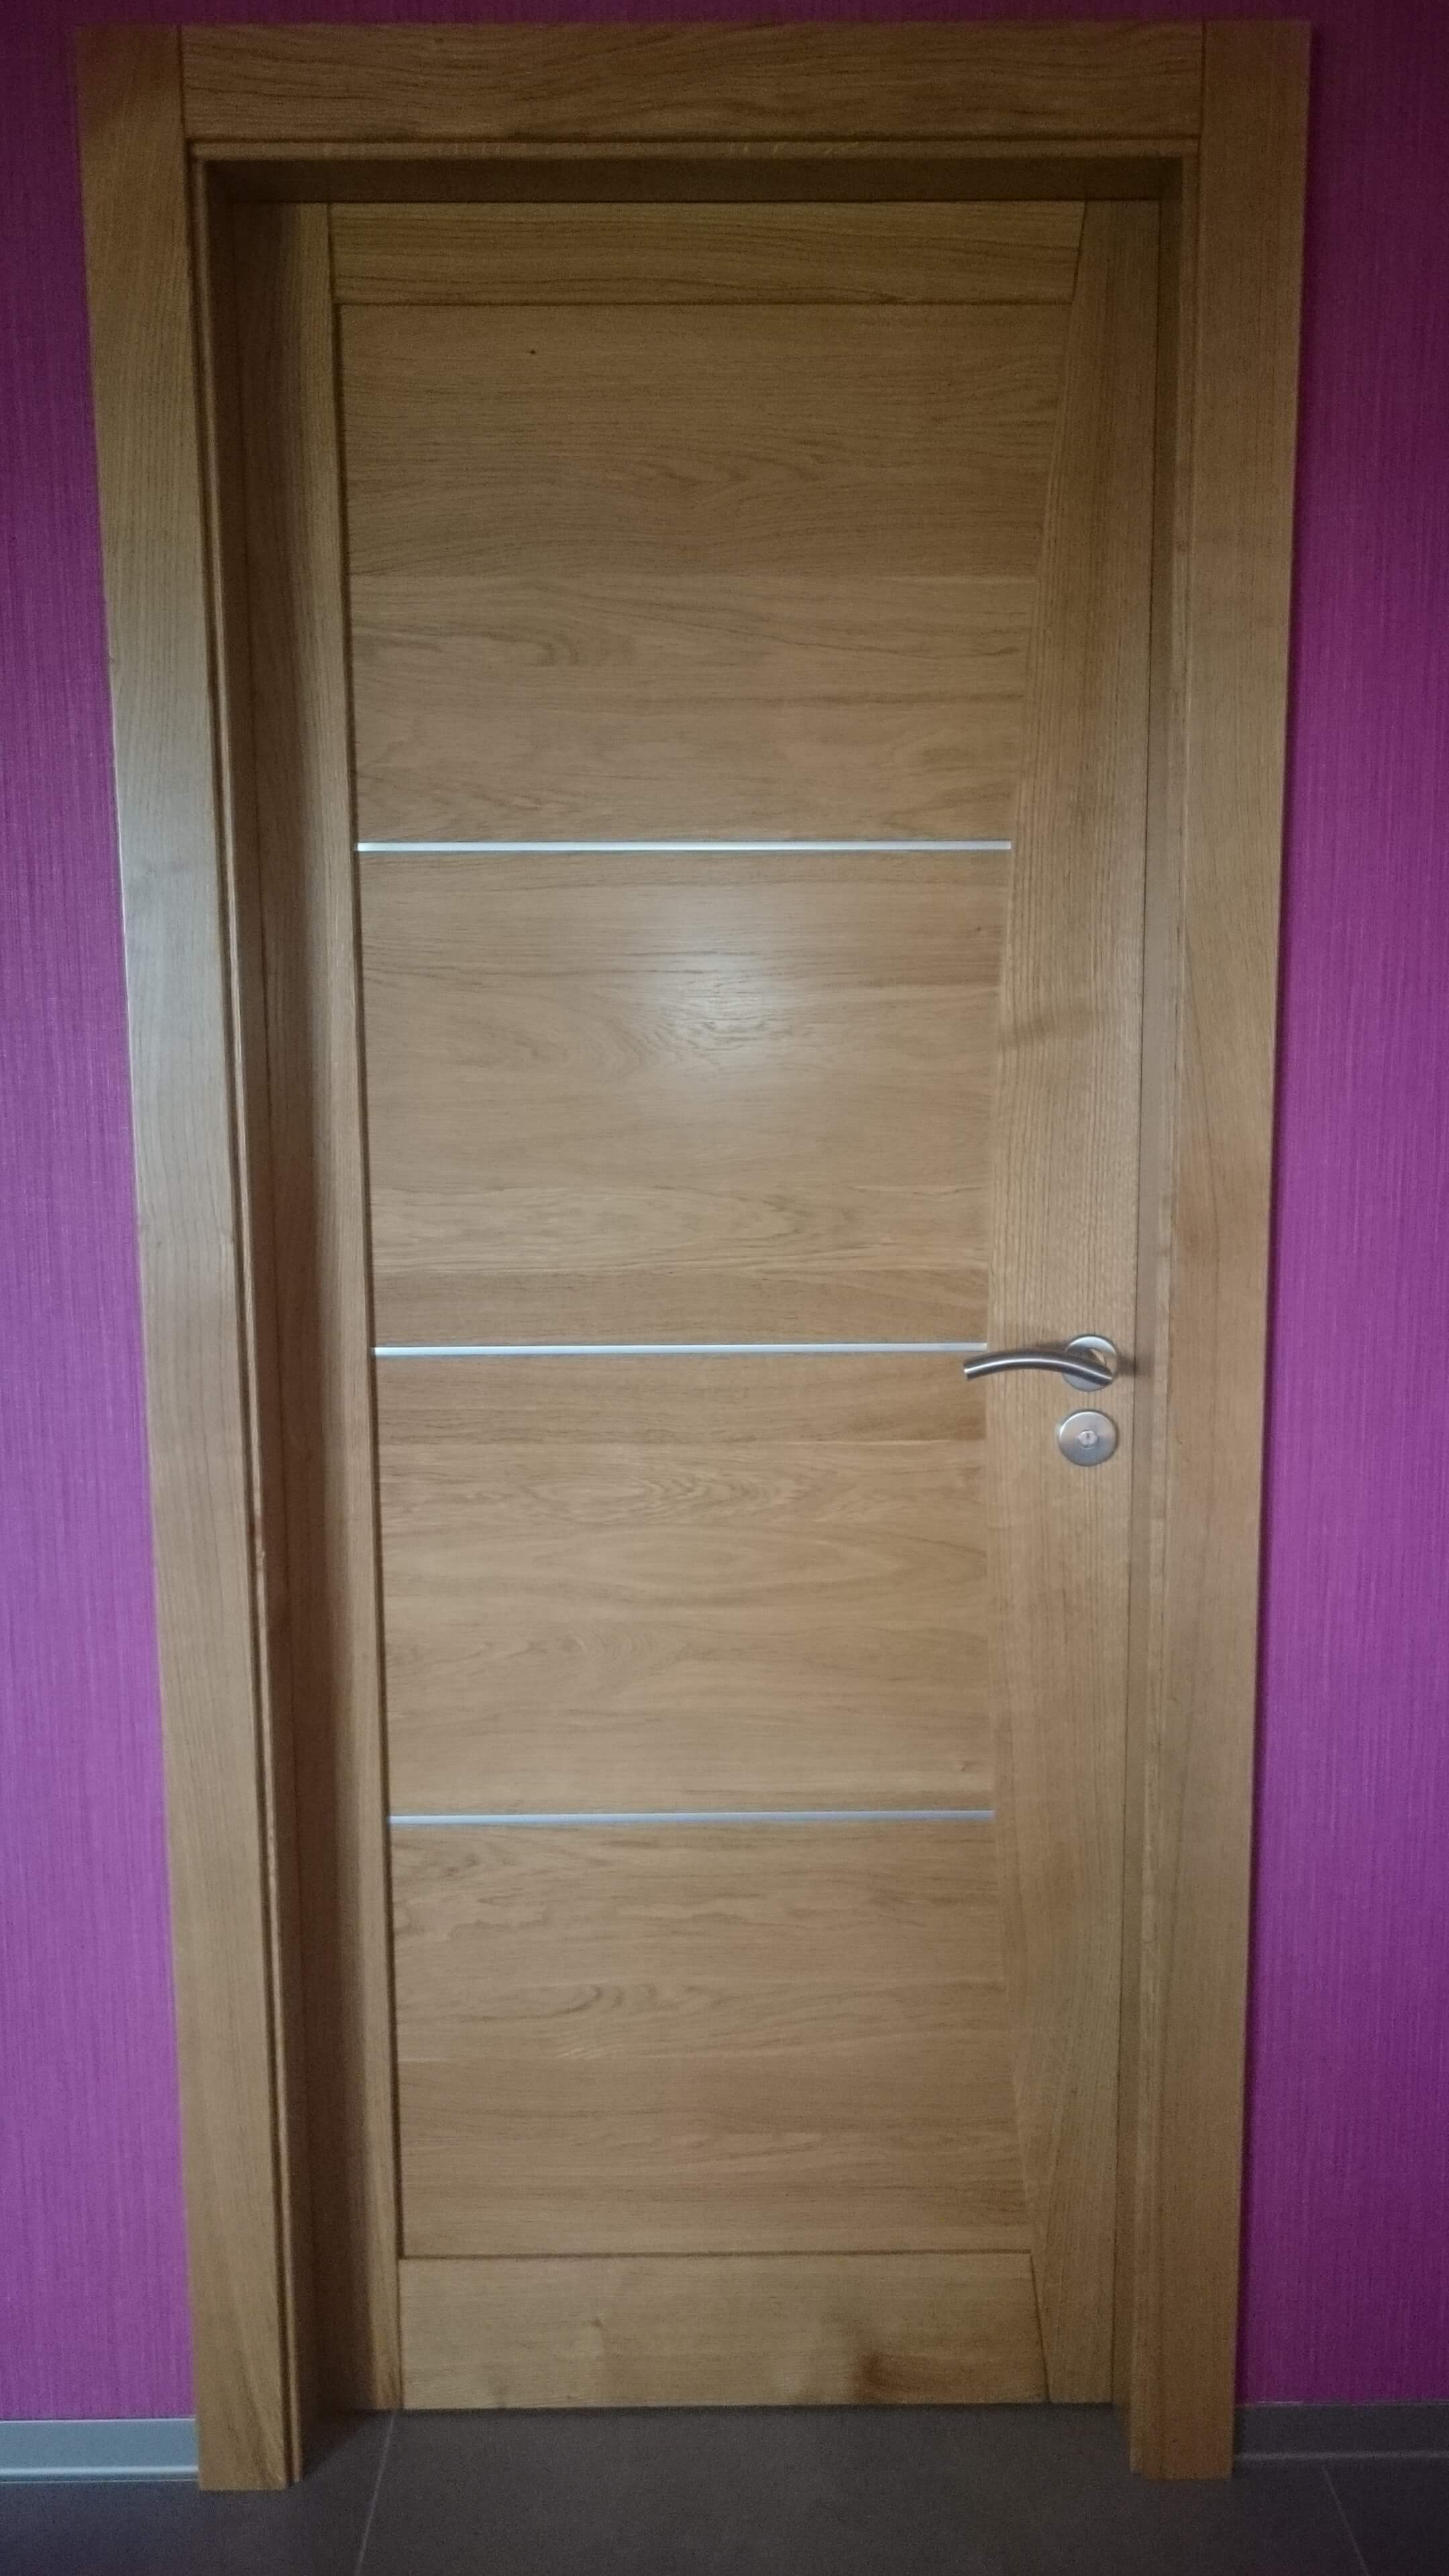 Menuiserie Figard - Fabrication sur mesure - Porte d'intérieure - Chêne insert alu - Vesoul